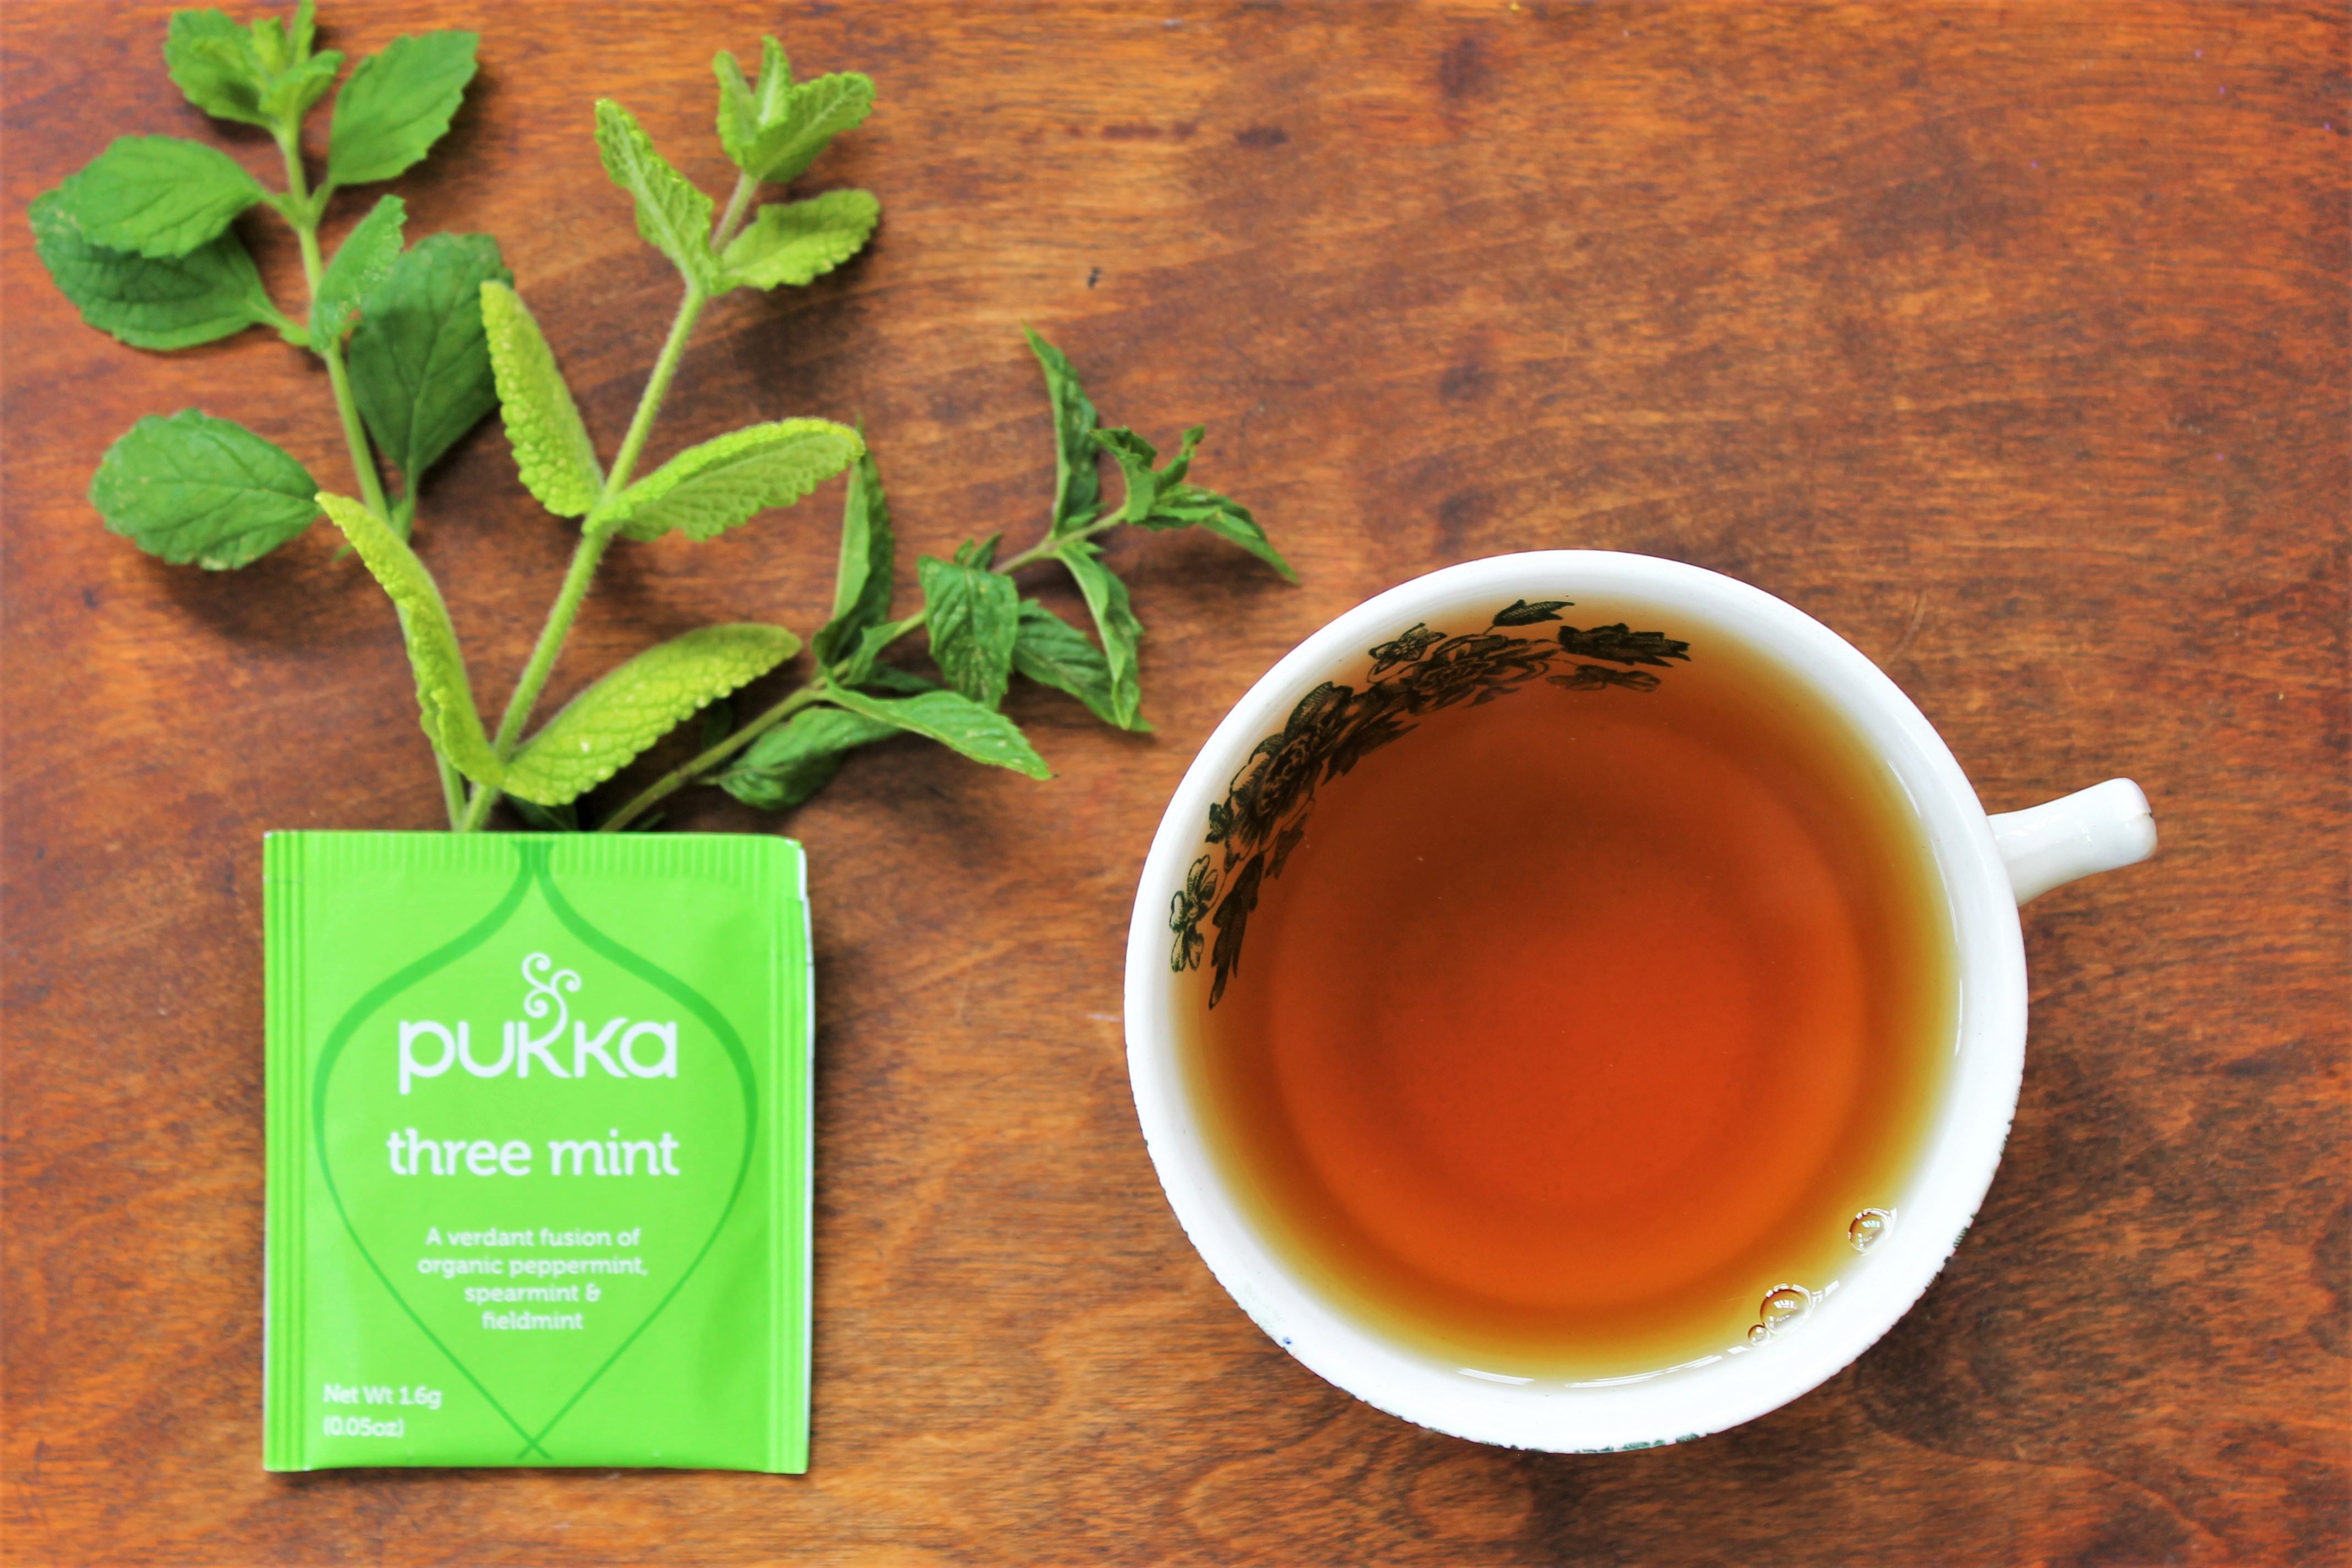 Pukka Three Mint Tea Review